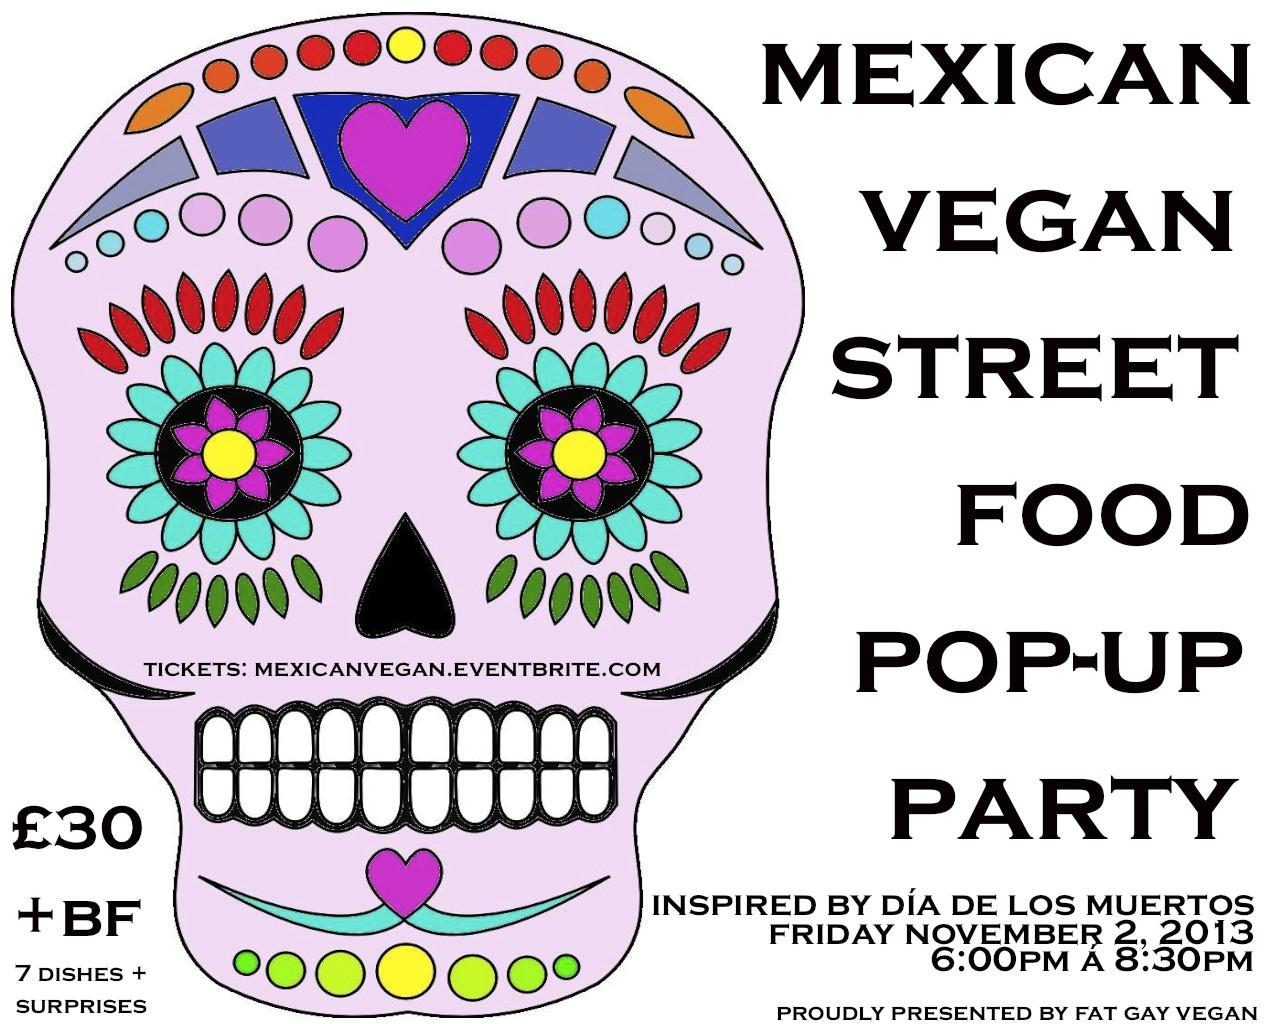 http://fatgayvegan.com/wp-content/uploads/2012/10/mexican1.jpg